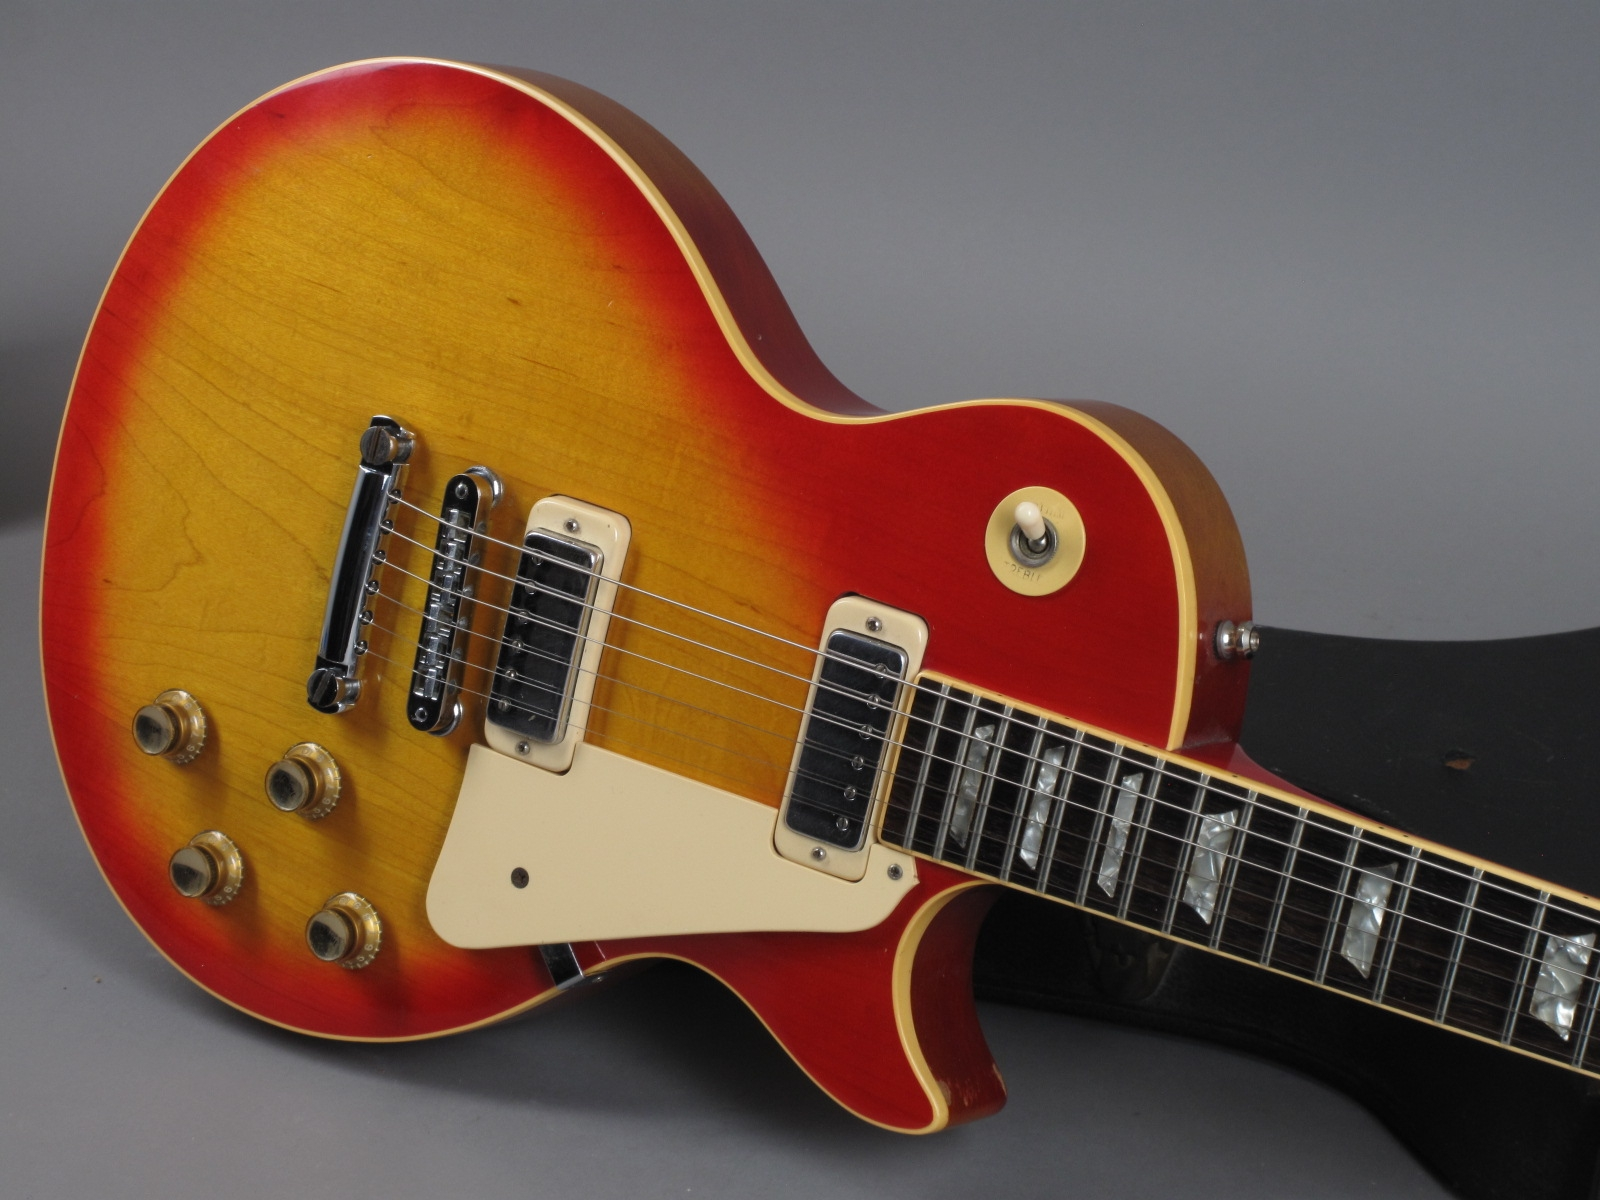 https://guitarpoint.de/app/uploads/products/1978-gibson-les-paul-deluxe-cherry-sunburst/1978-Gibson-Les-Paul-DeLuxe-Cherry-Sunburst-70668520_19.jpg